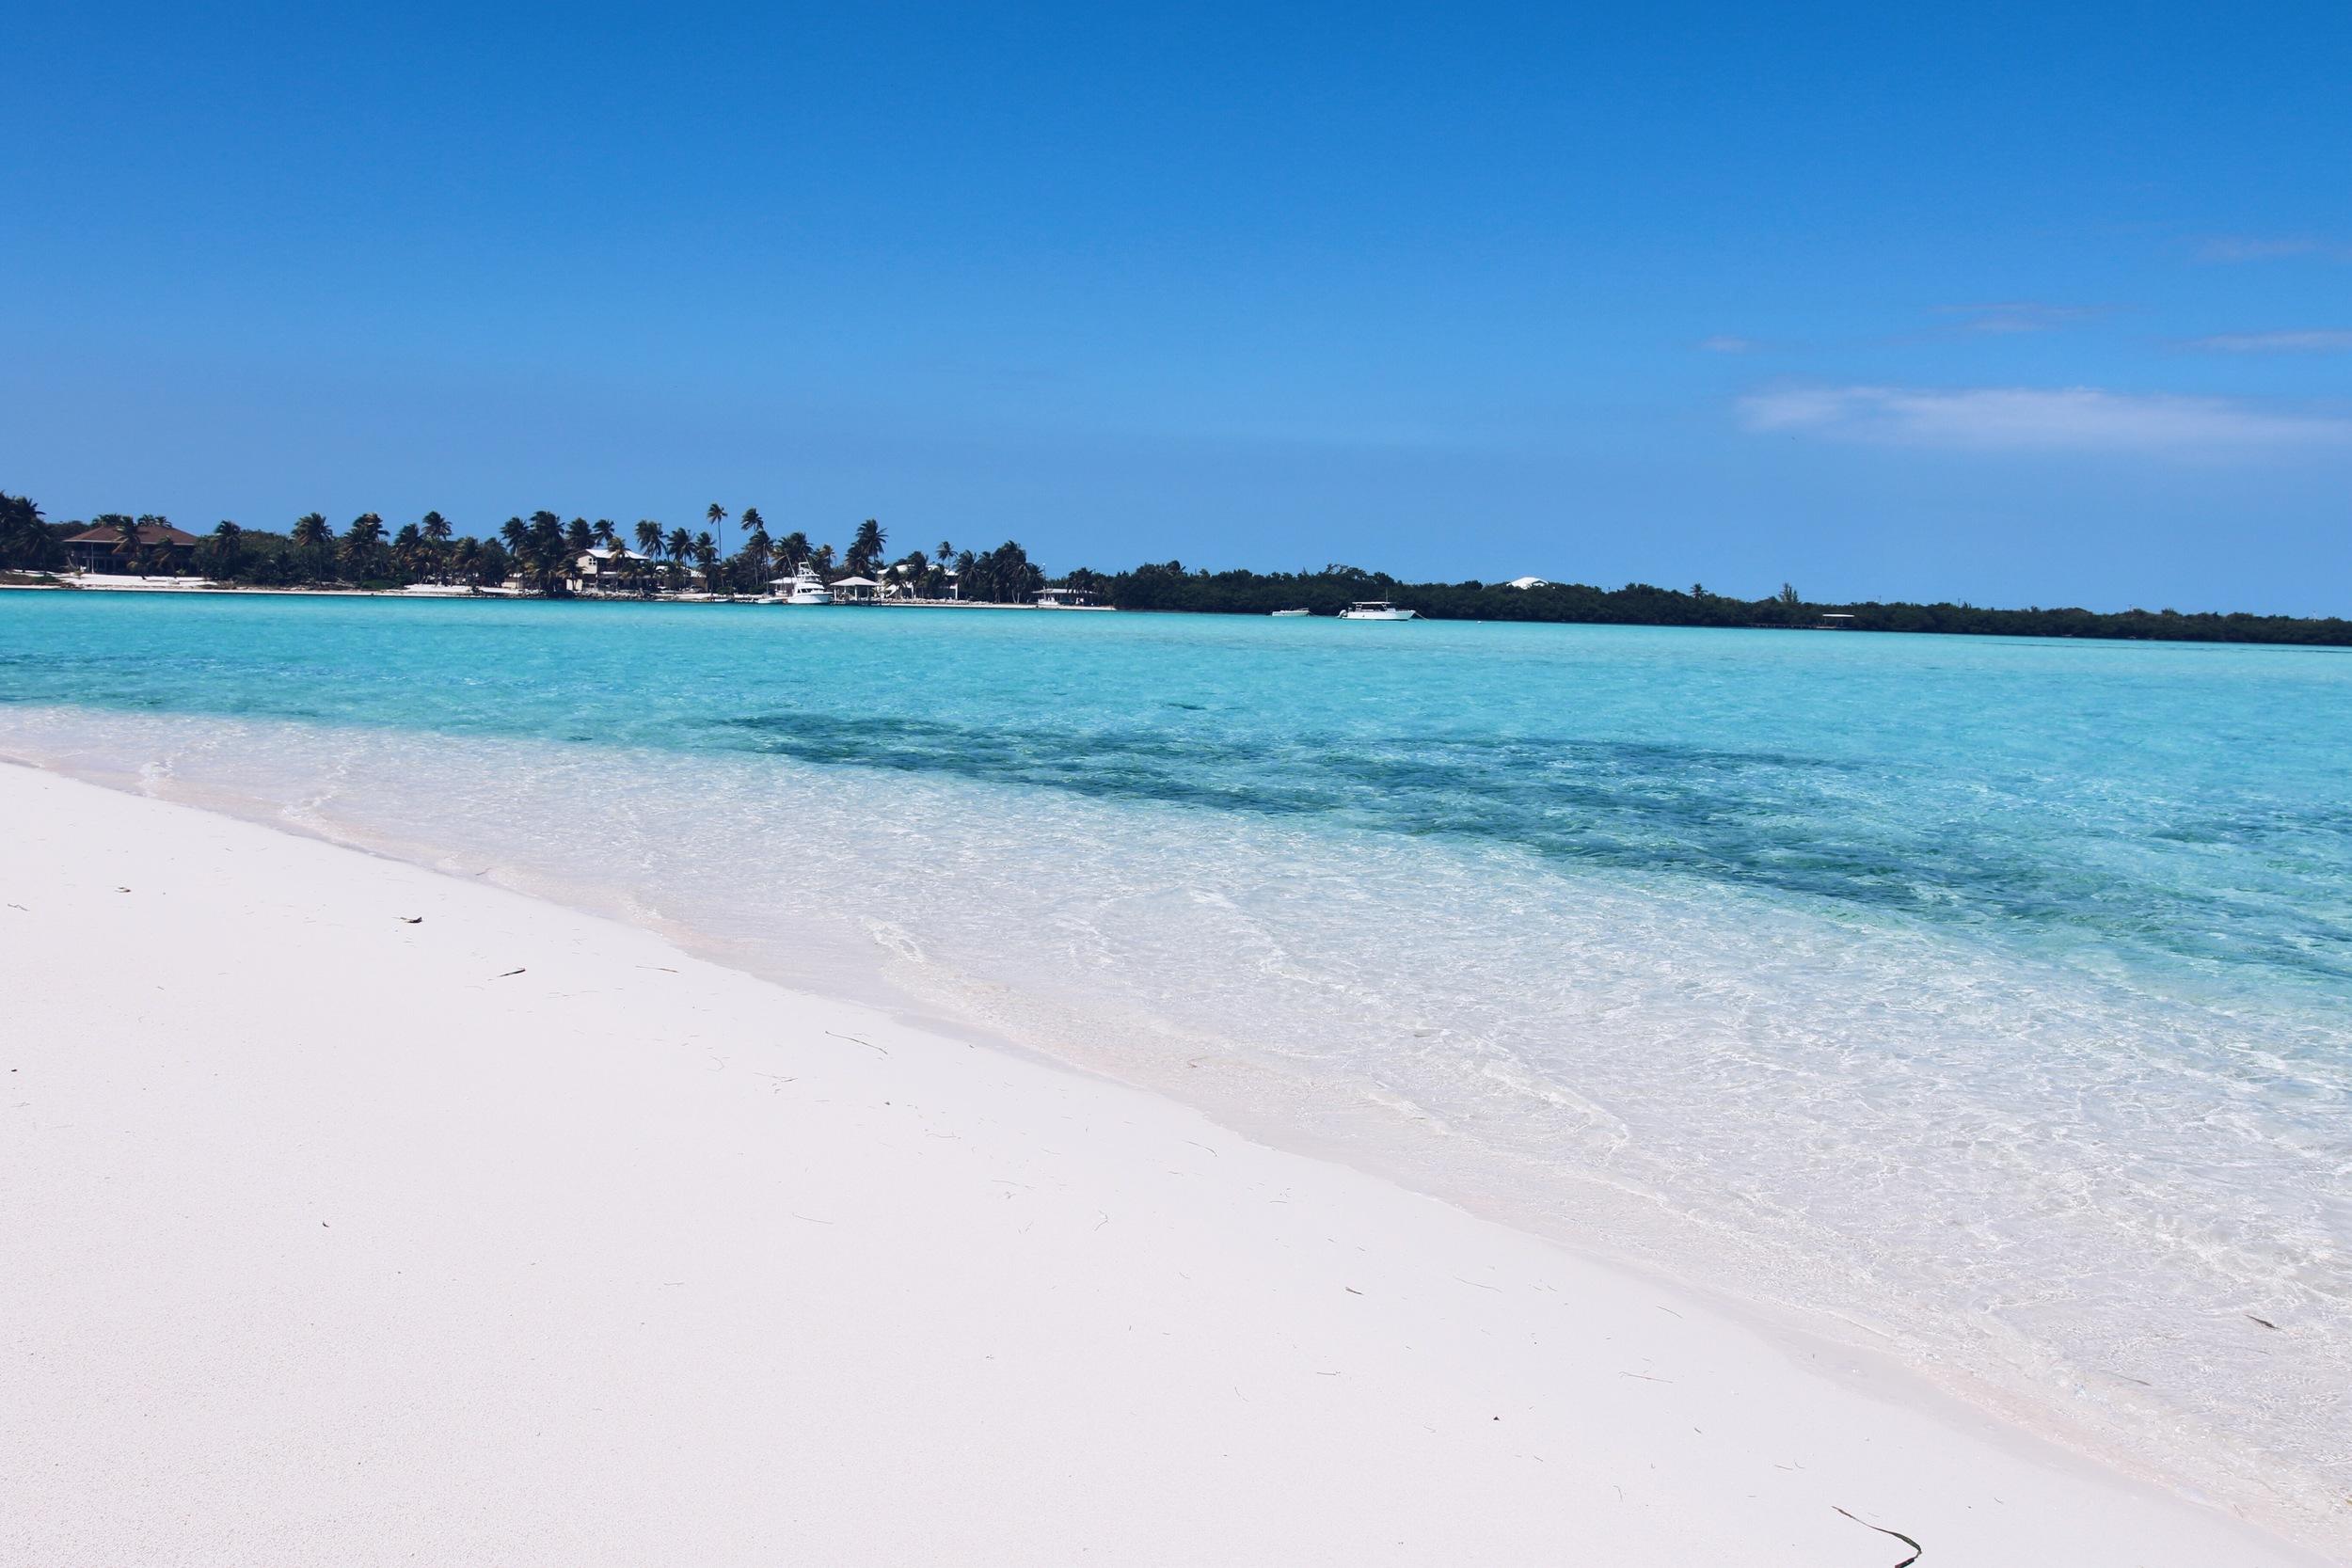 Owen Island_Little Cayman